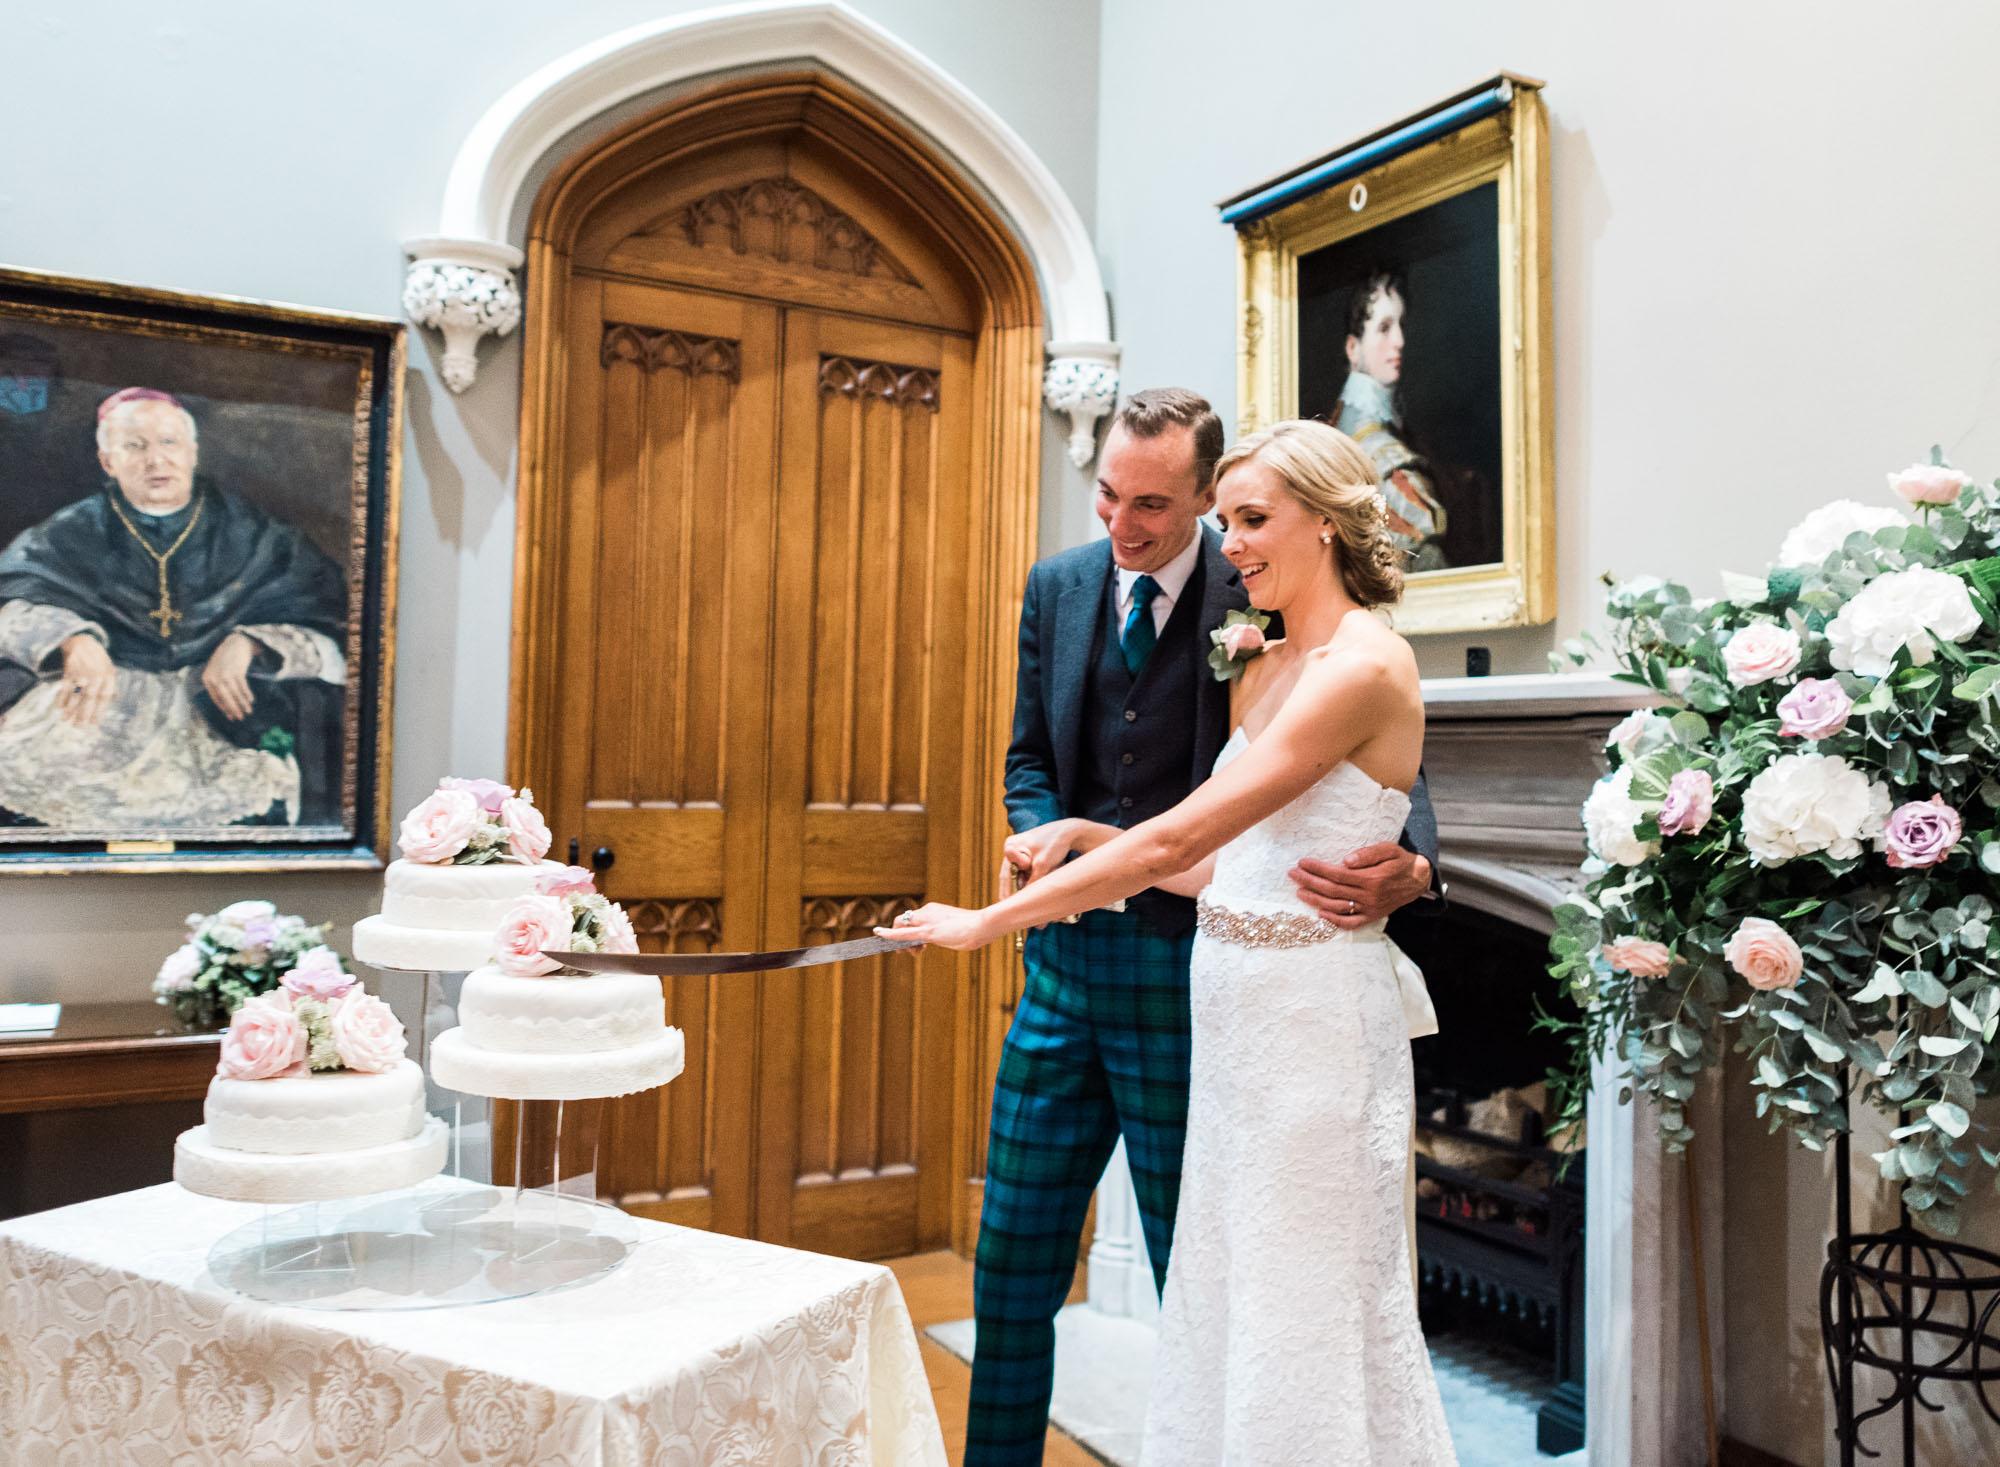 scottish_wedding_blairquhan_castle-103.jpg